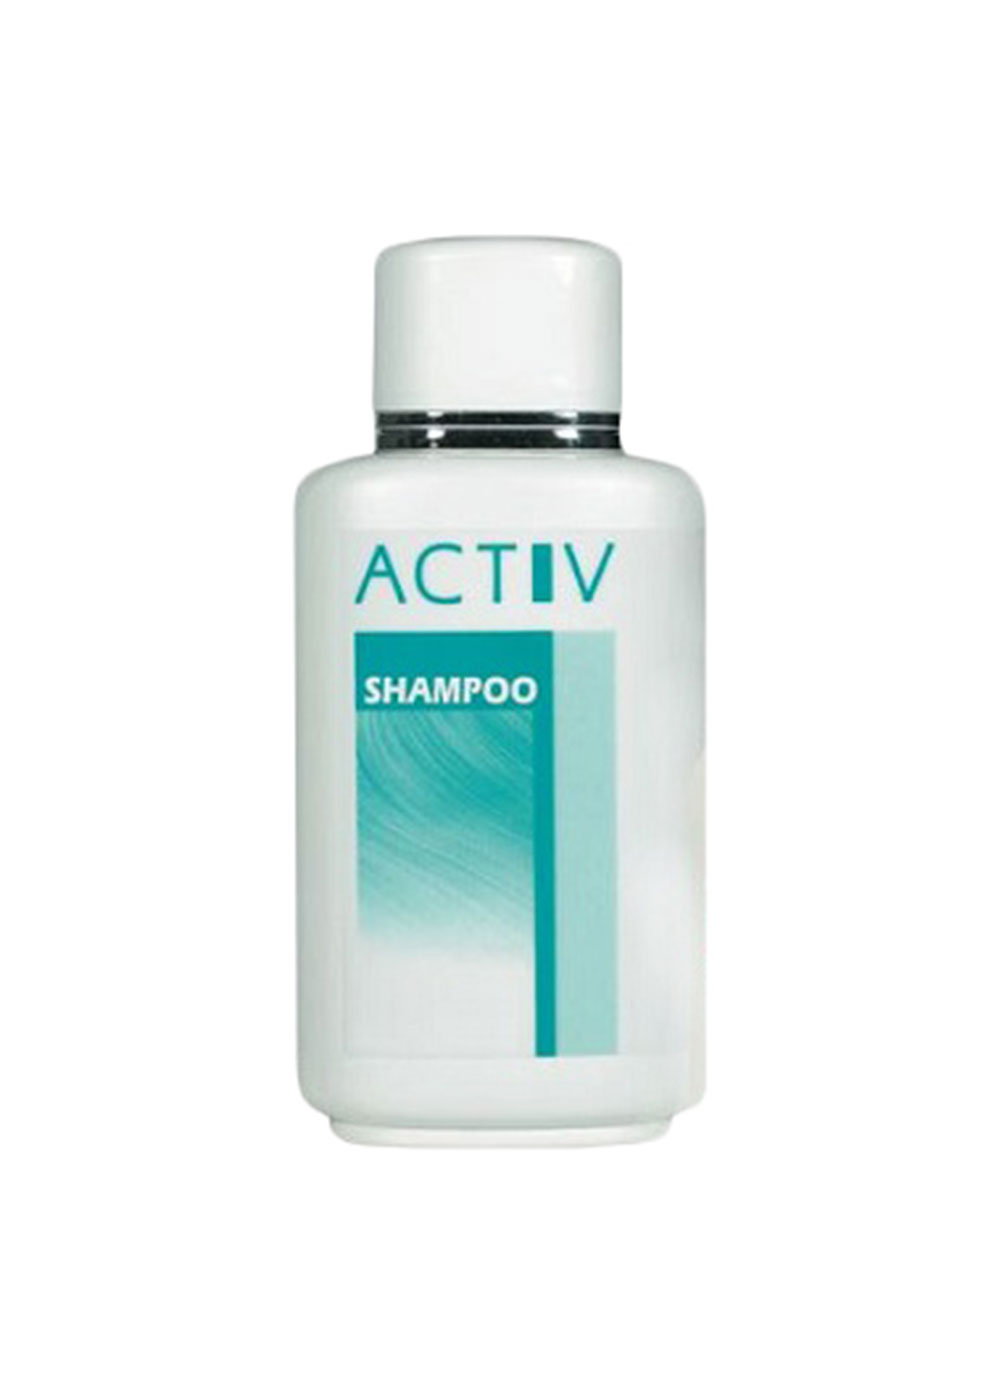 GFH Zubehör - Activ Shampoo Kunsthaar 250ml